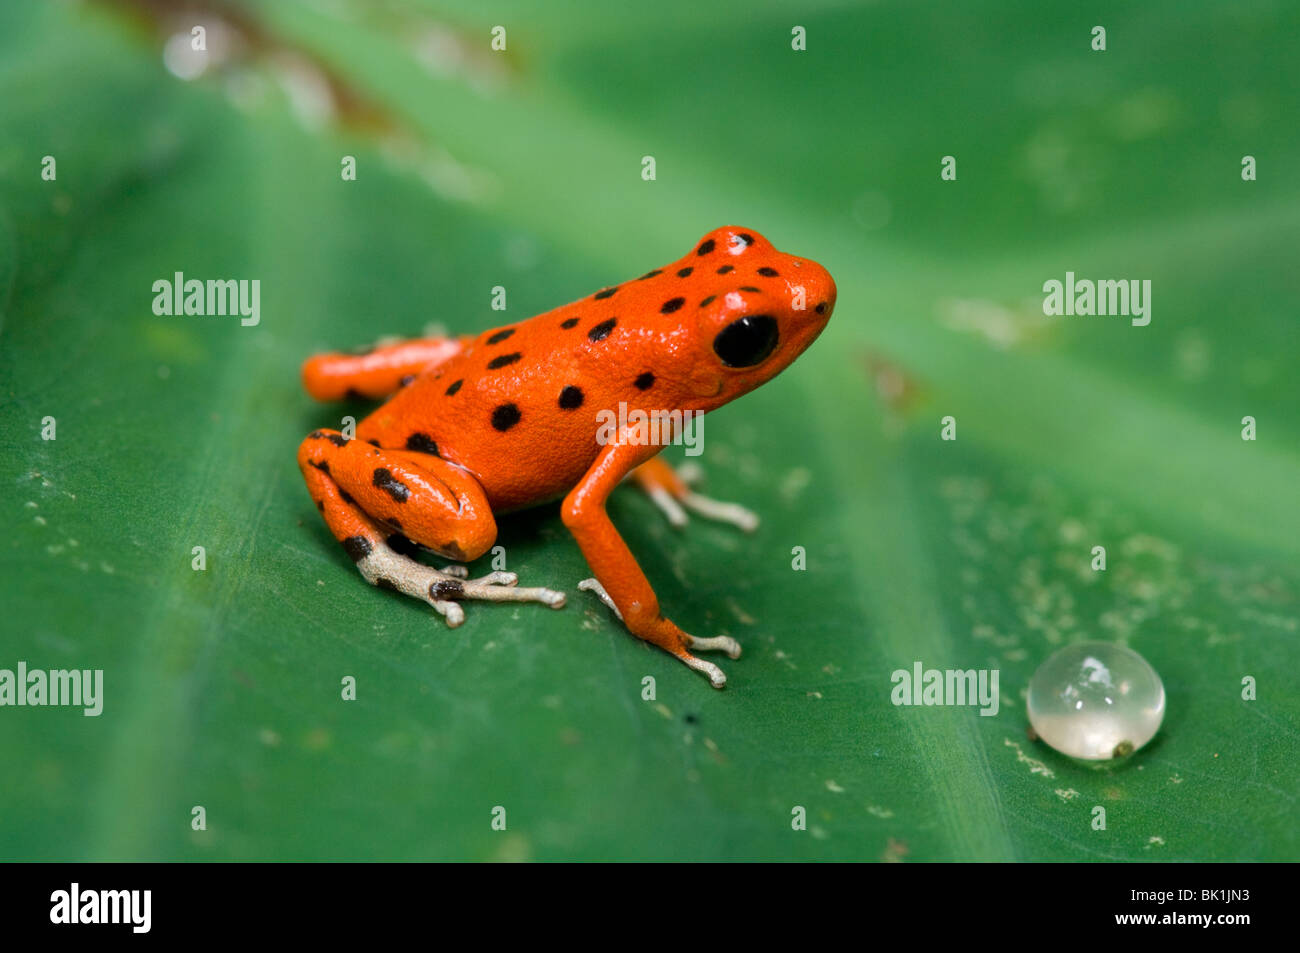 Red Dart Frog (Dendrobates pumilio), Panama - Stock Image